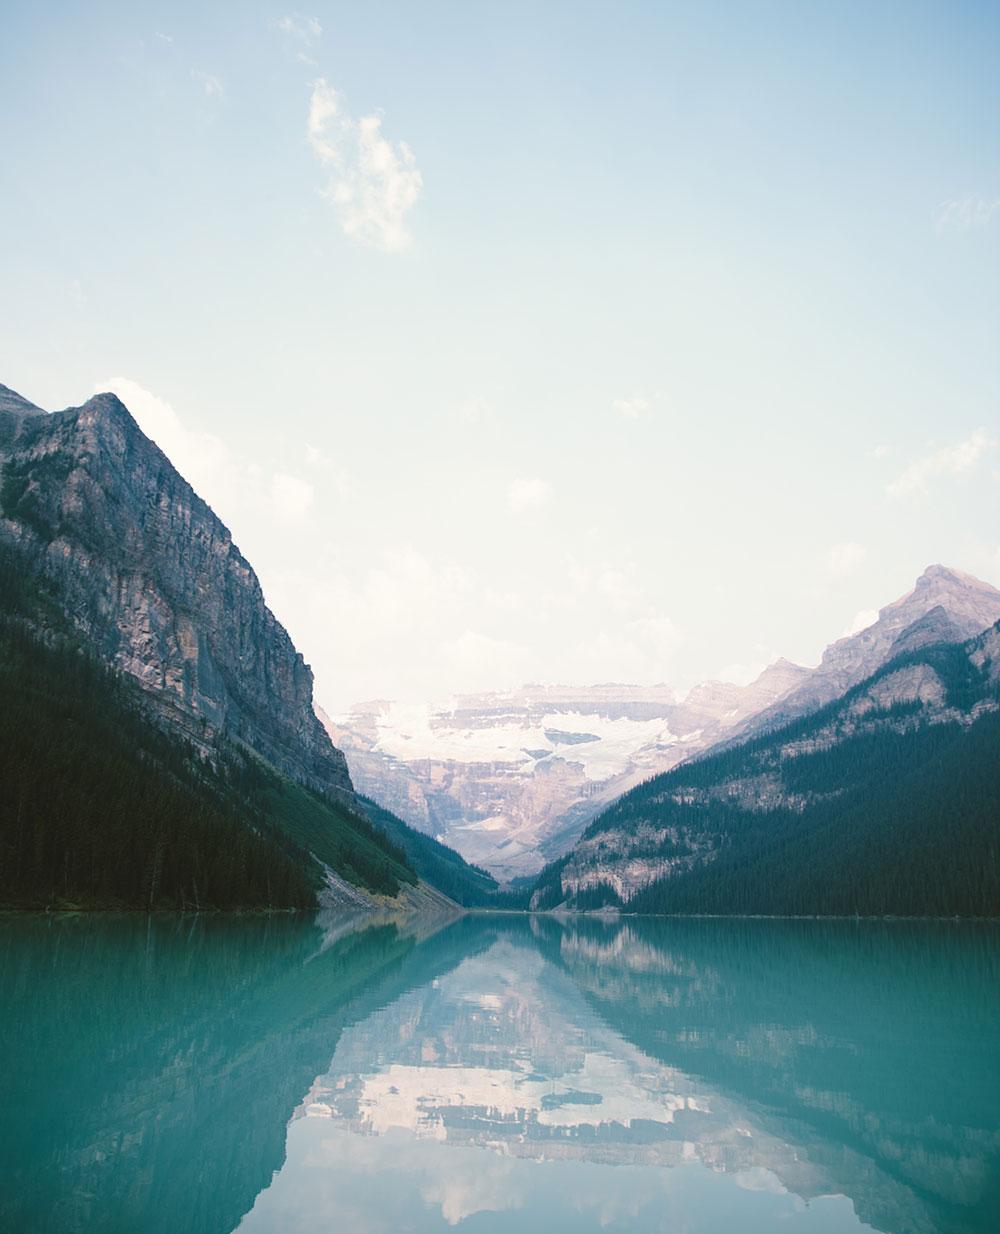 River vs Mountain